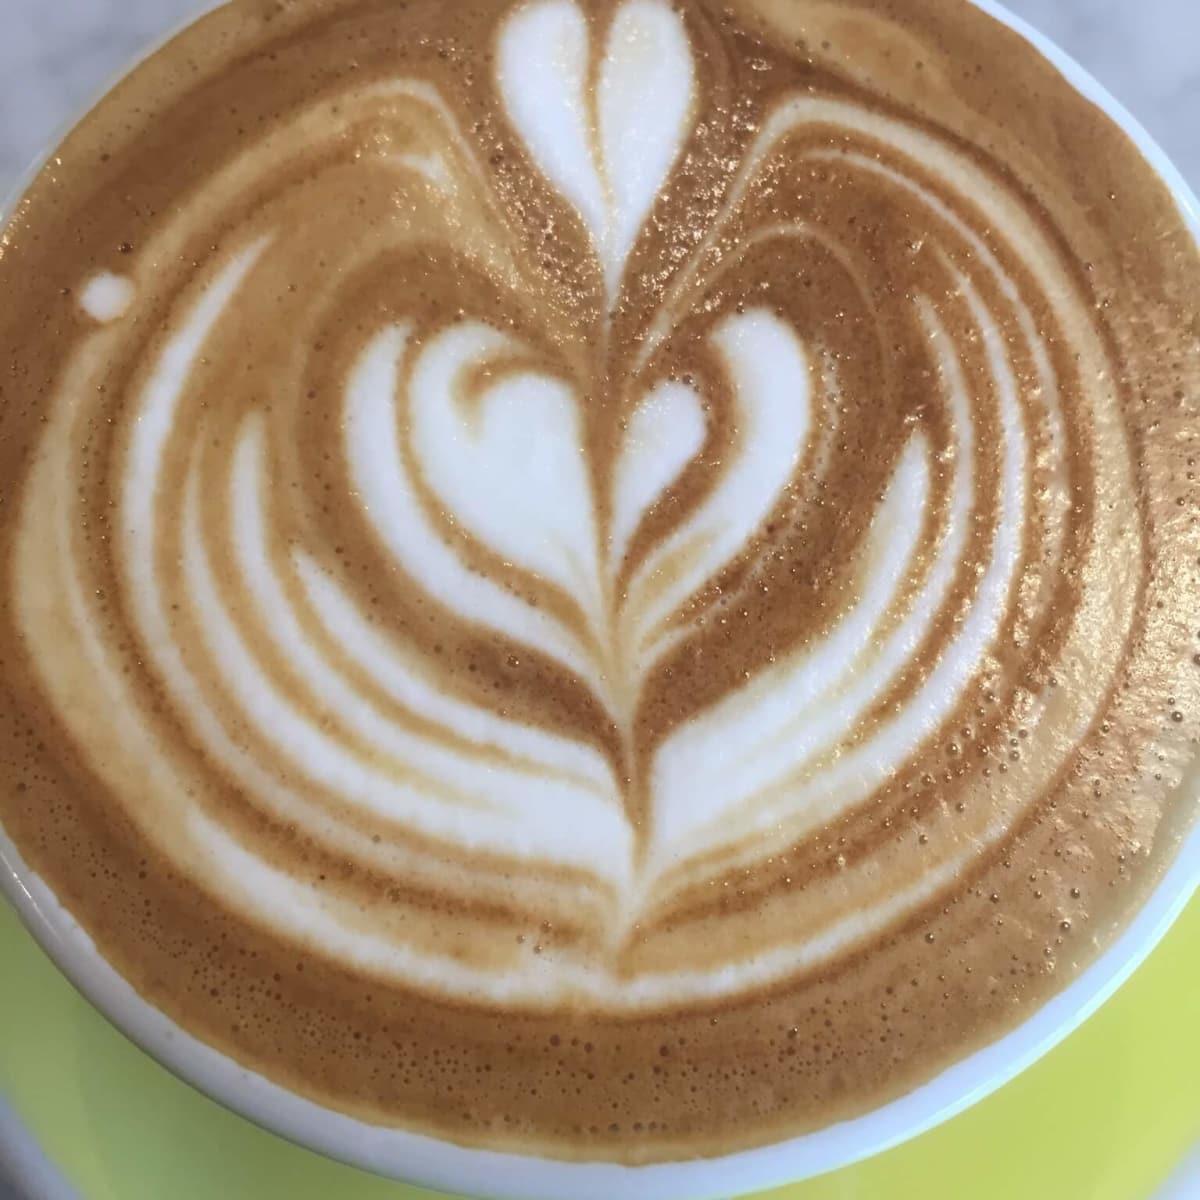 Dandelion cafe flat white